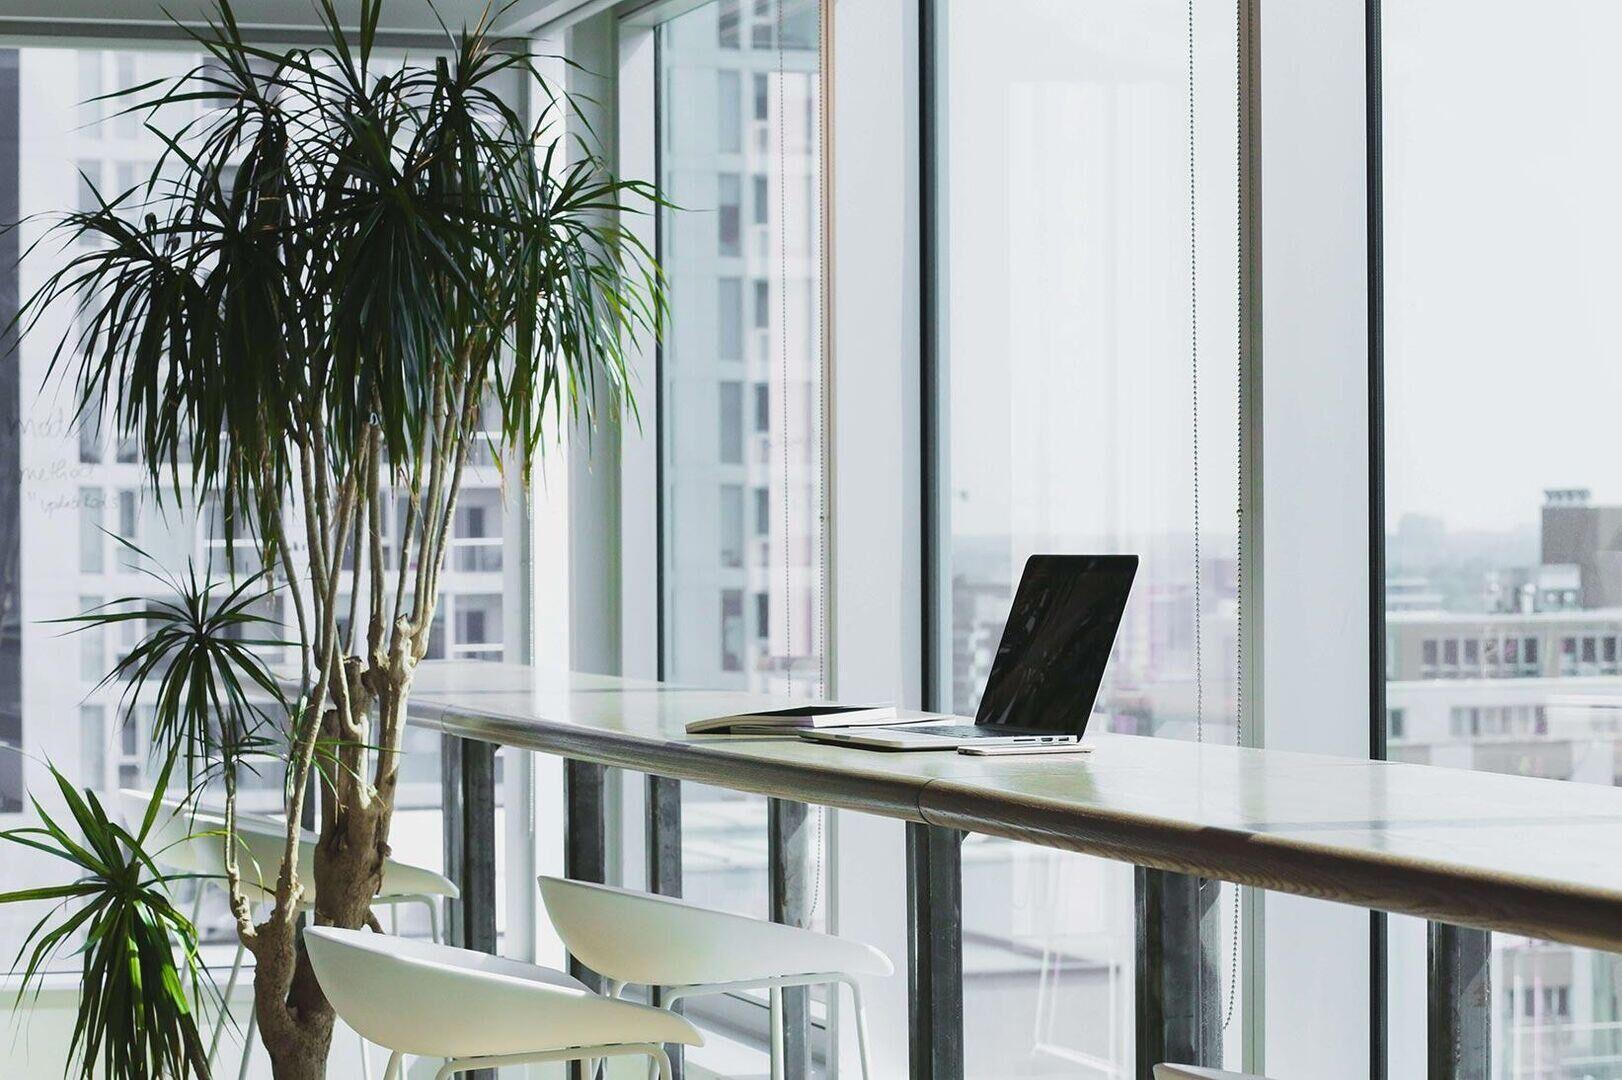 Why get private advice alongside corporate advice?